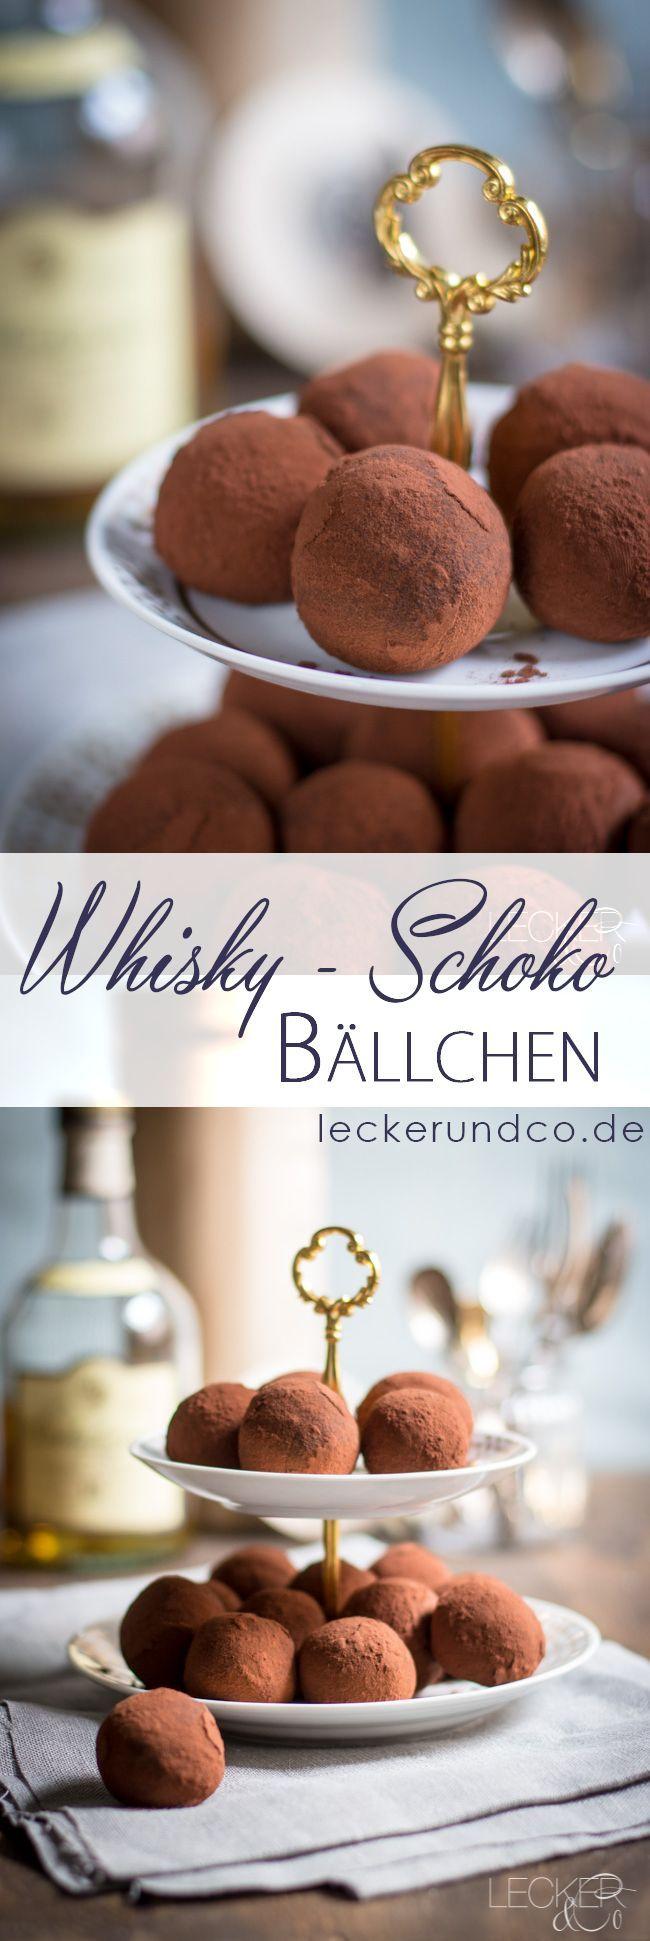 Whisky Schokoladen Bällchen | LECKER&Co | Foodblog aus Nürnberg